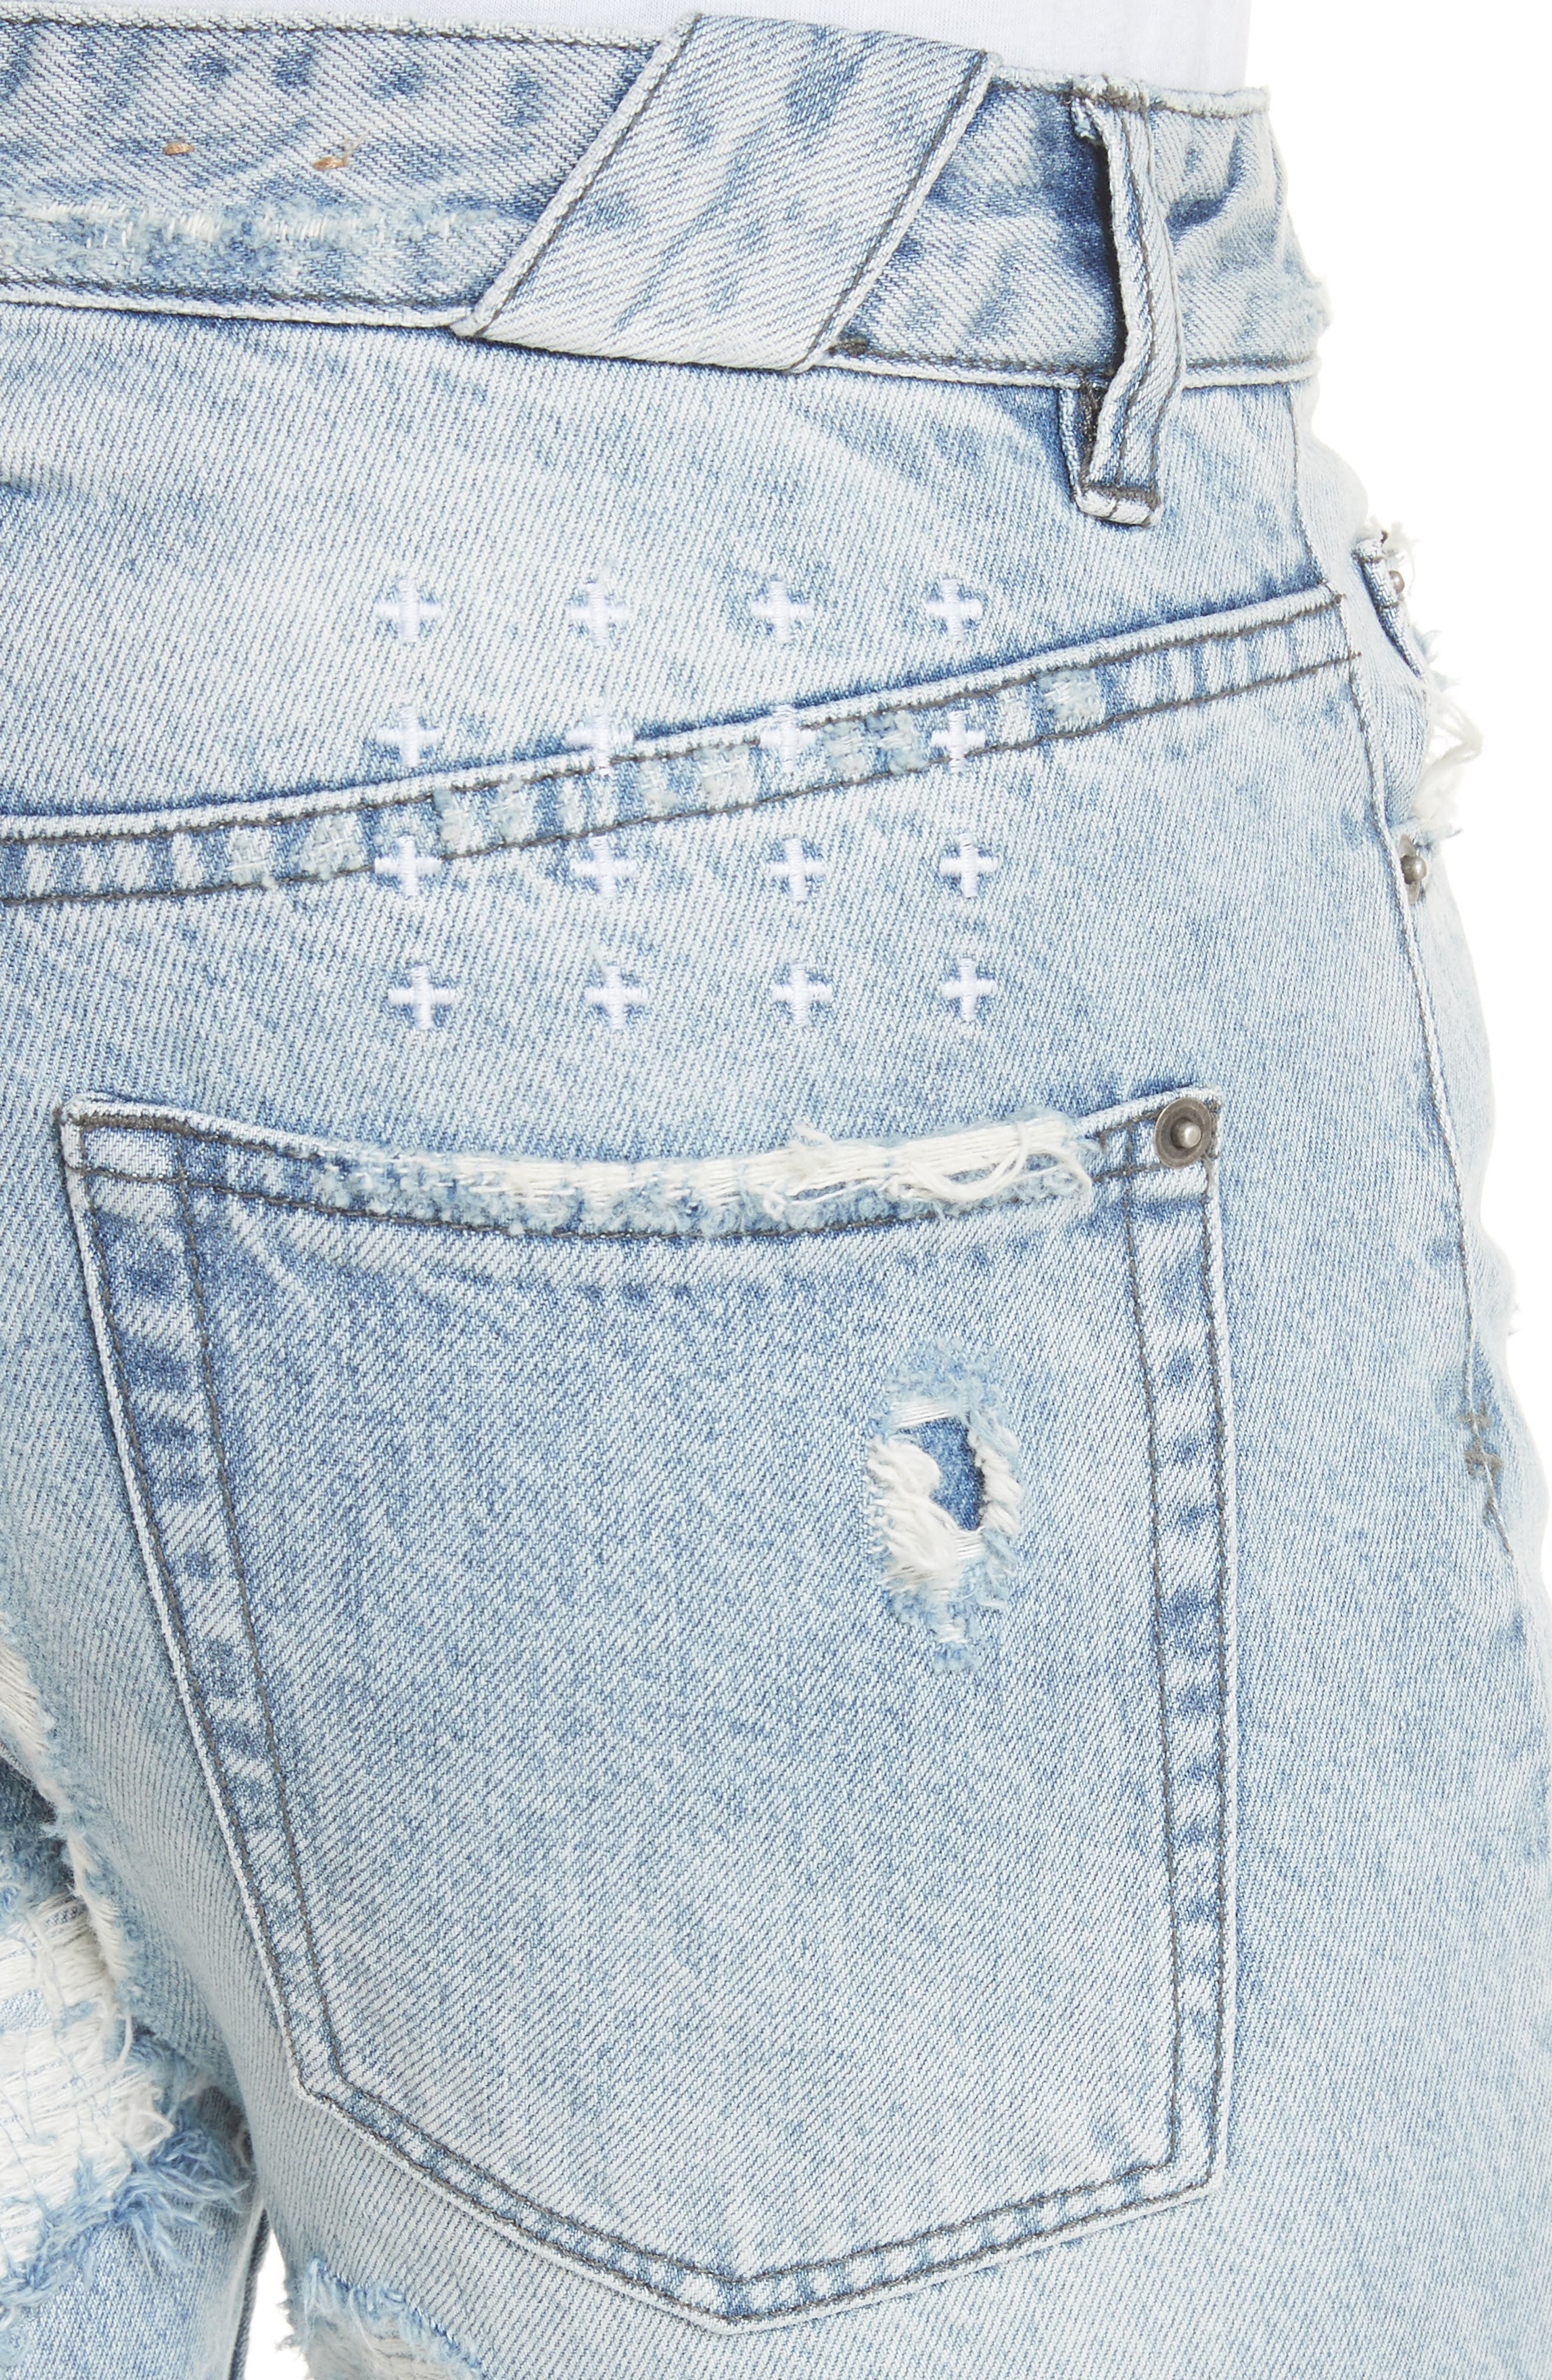 Chitch Tropo Trash Jeans,                             Alternate thumbnail 4, color,                             DENIM